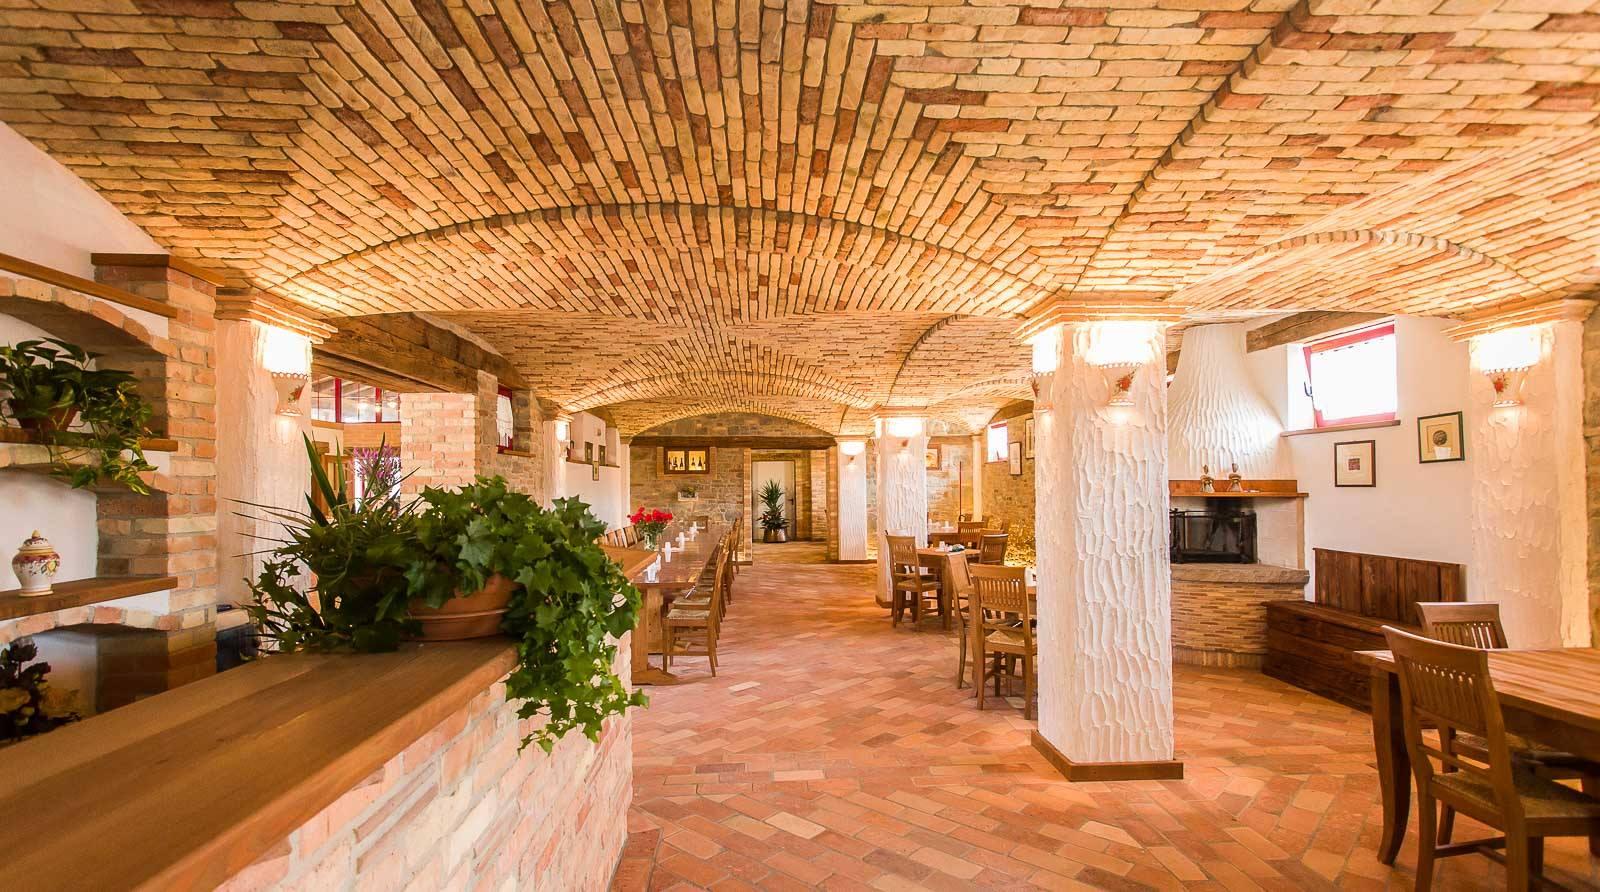 Sala da pranzo e colazioni per agriturismo ad Aquileia ...